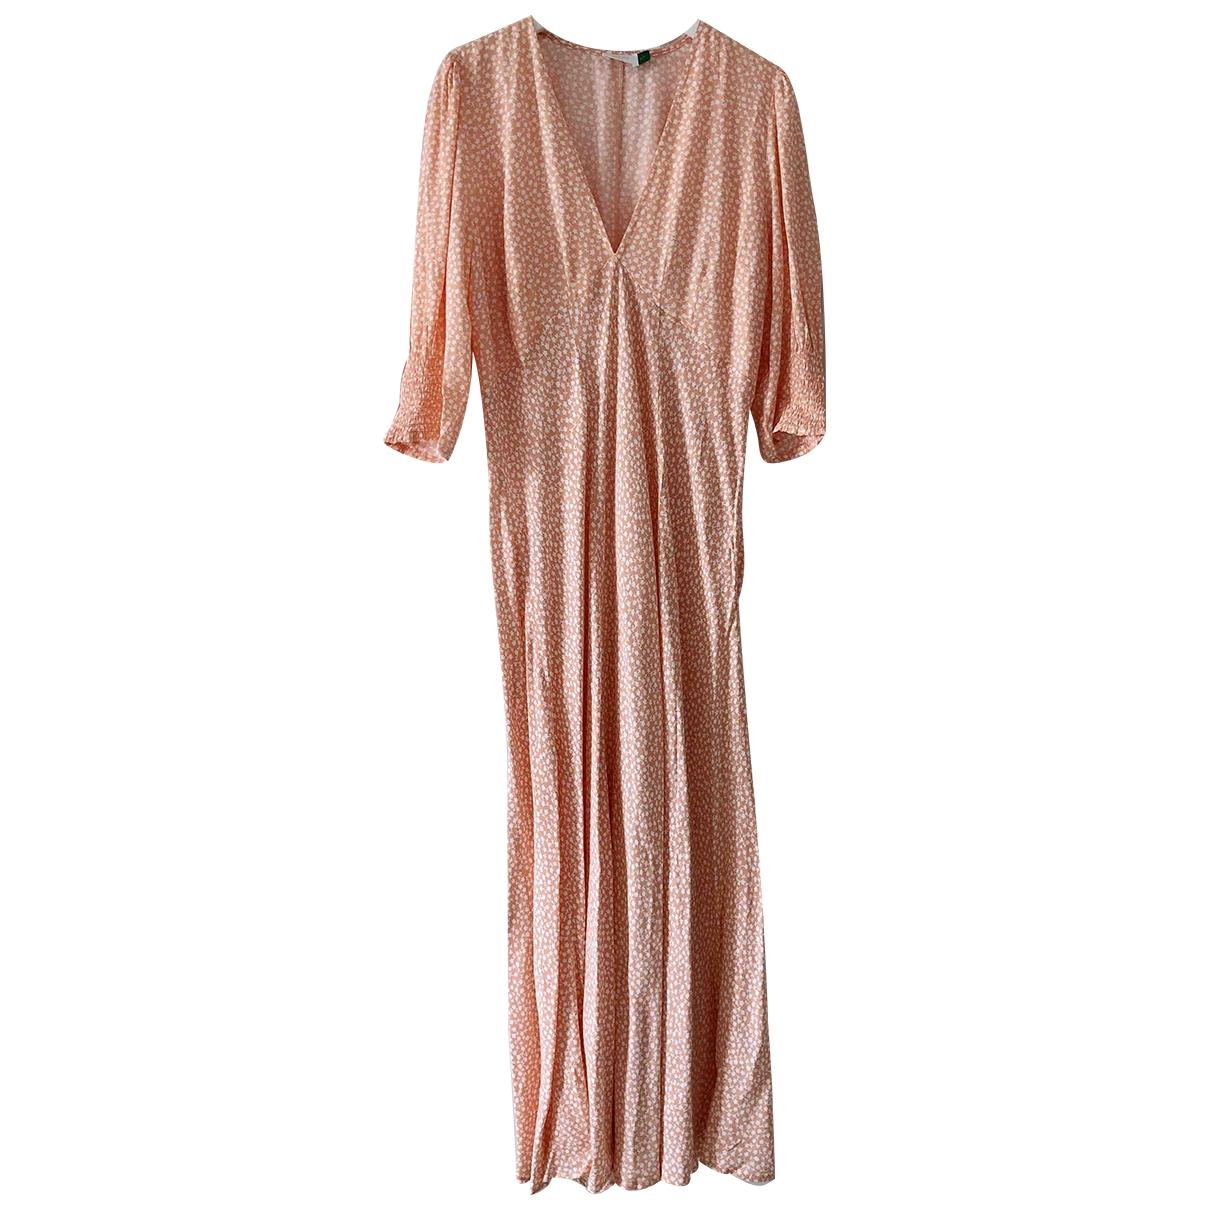 Rixo \N Pink dress for Women S International